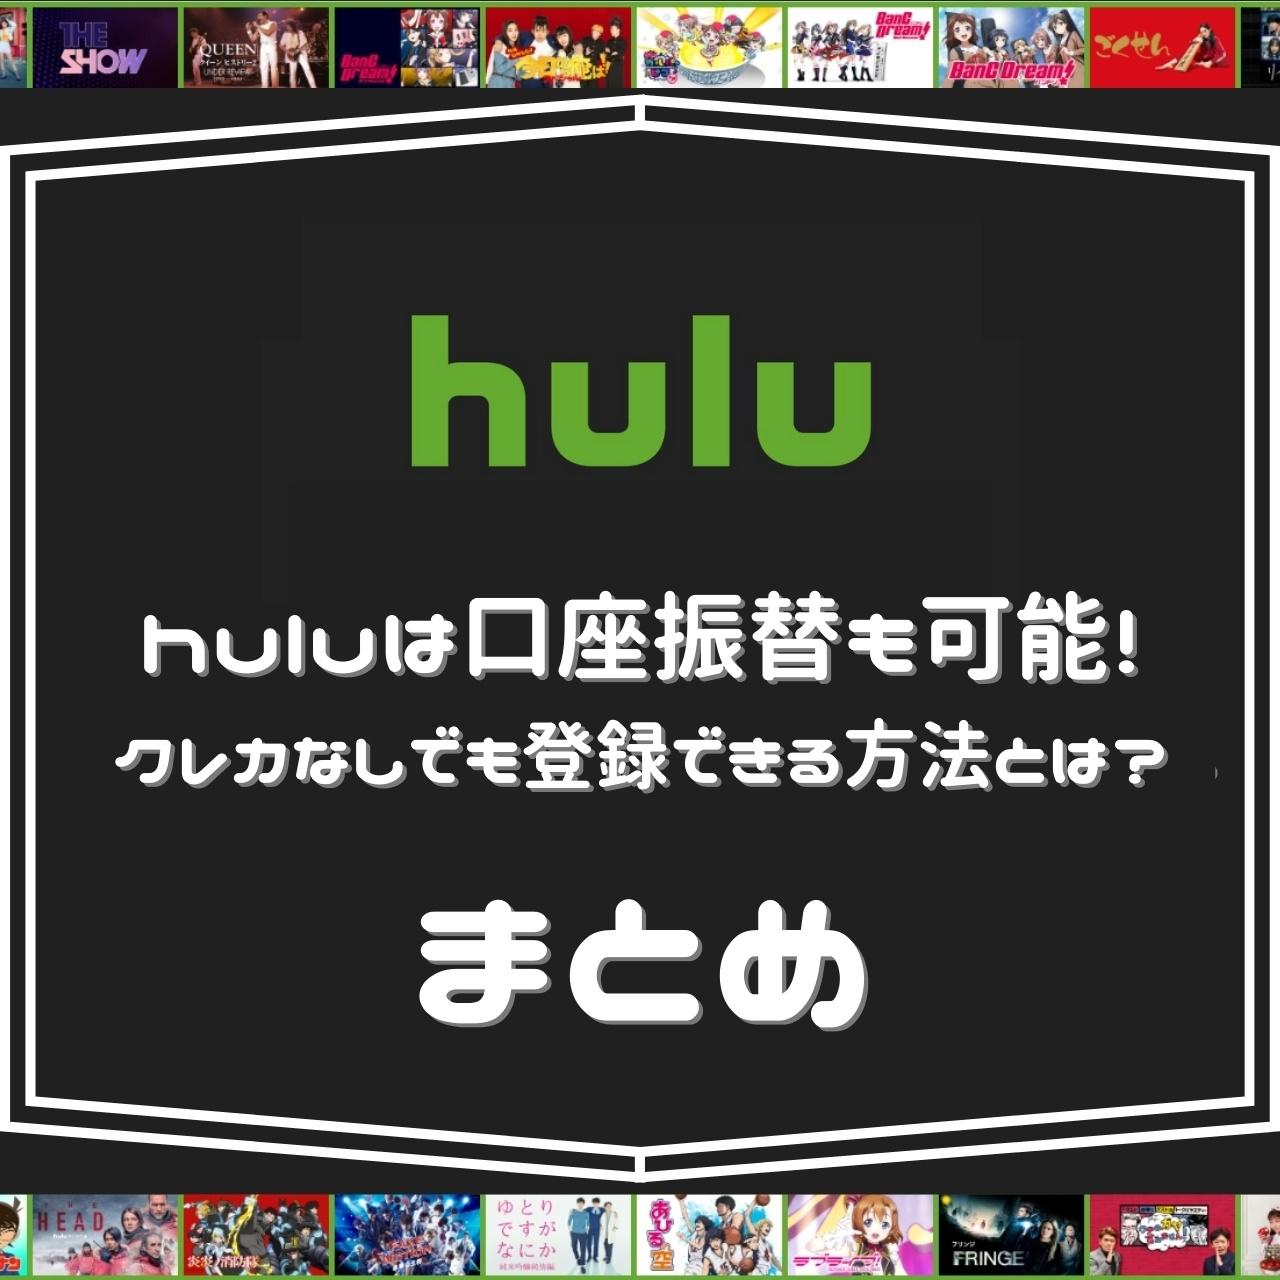 huluは口座振替も可能!クレカなしでも登録できる方法とは?|まとめ